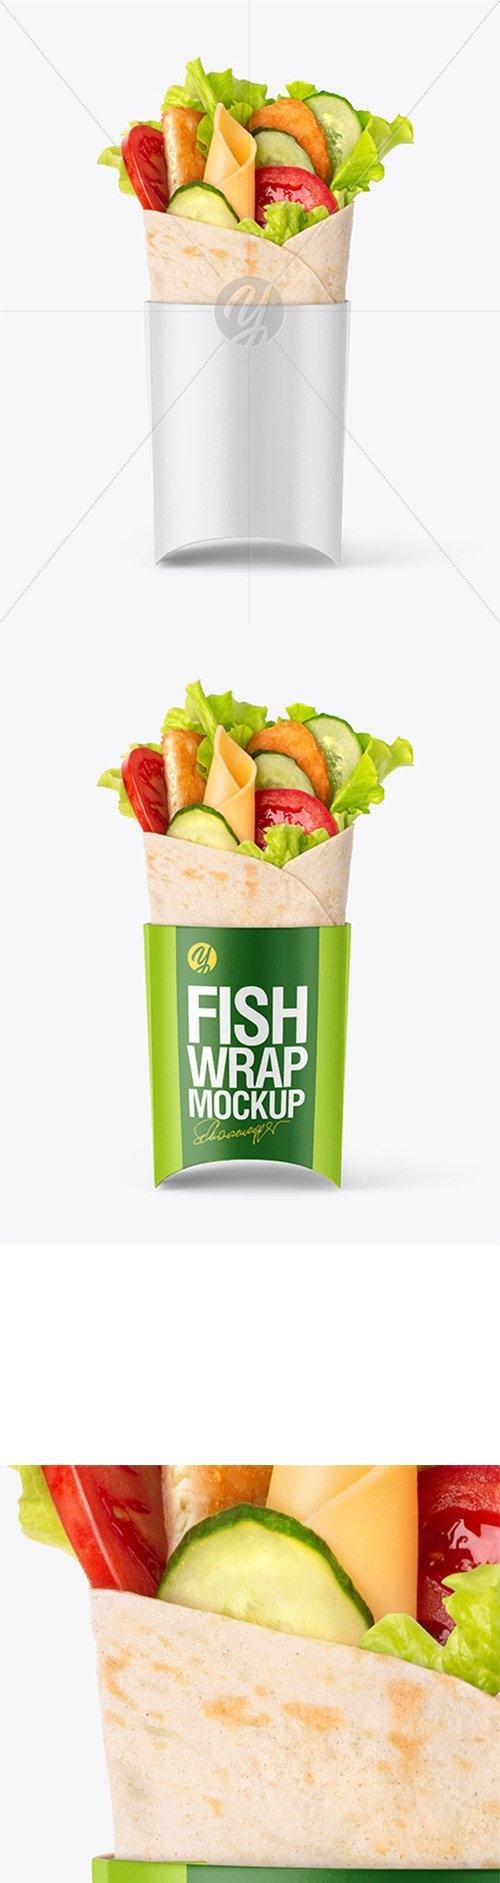 Fish Wrap Mockup 39337